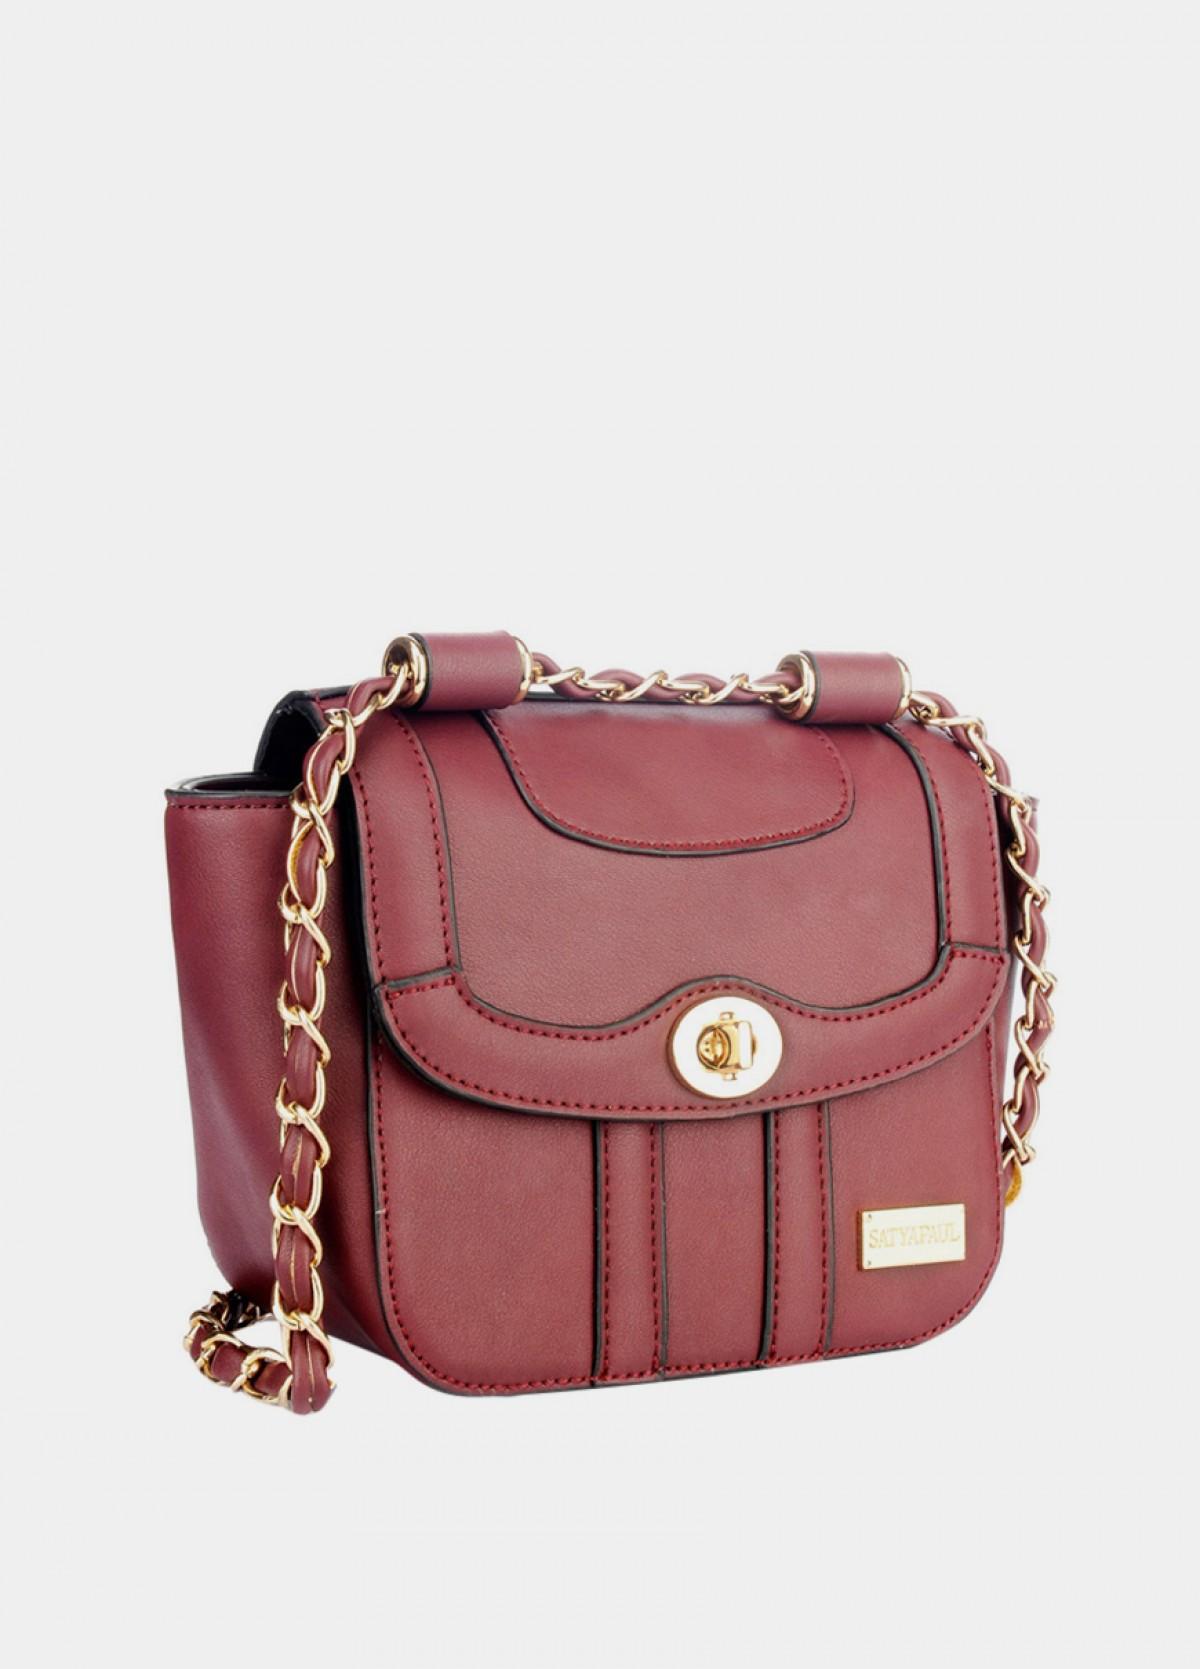 The Burgundy Sling Bag